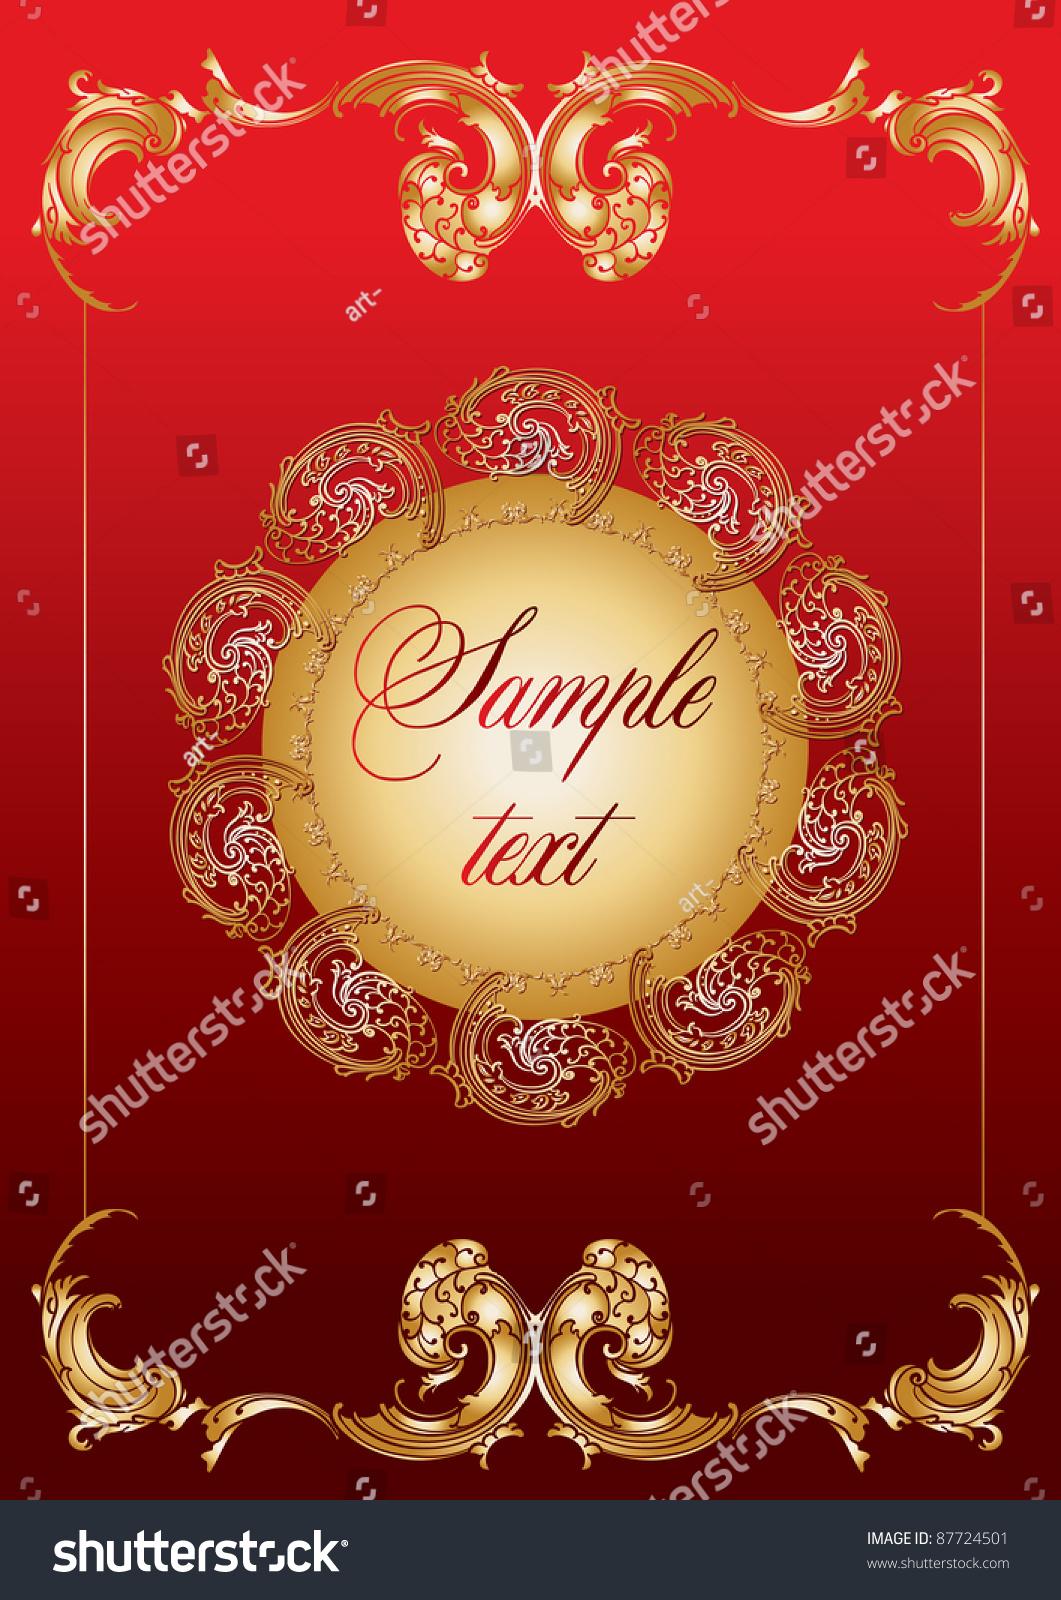 Cute Wedding Invitation Card Vintage Ornament Stock Vector 87724501 ...